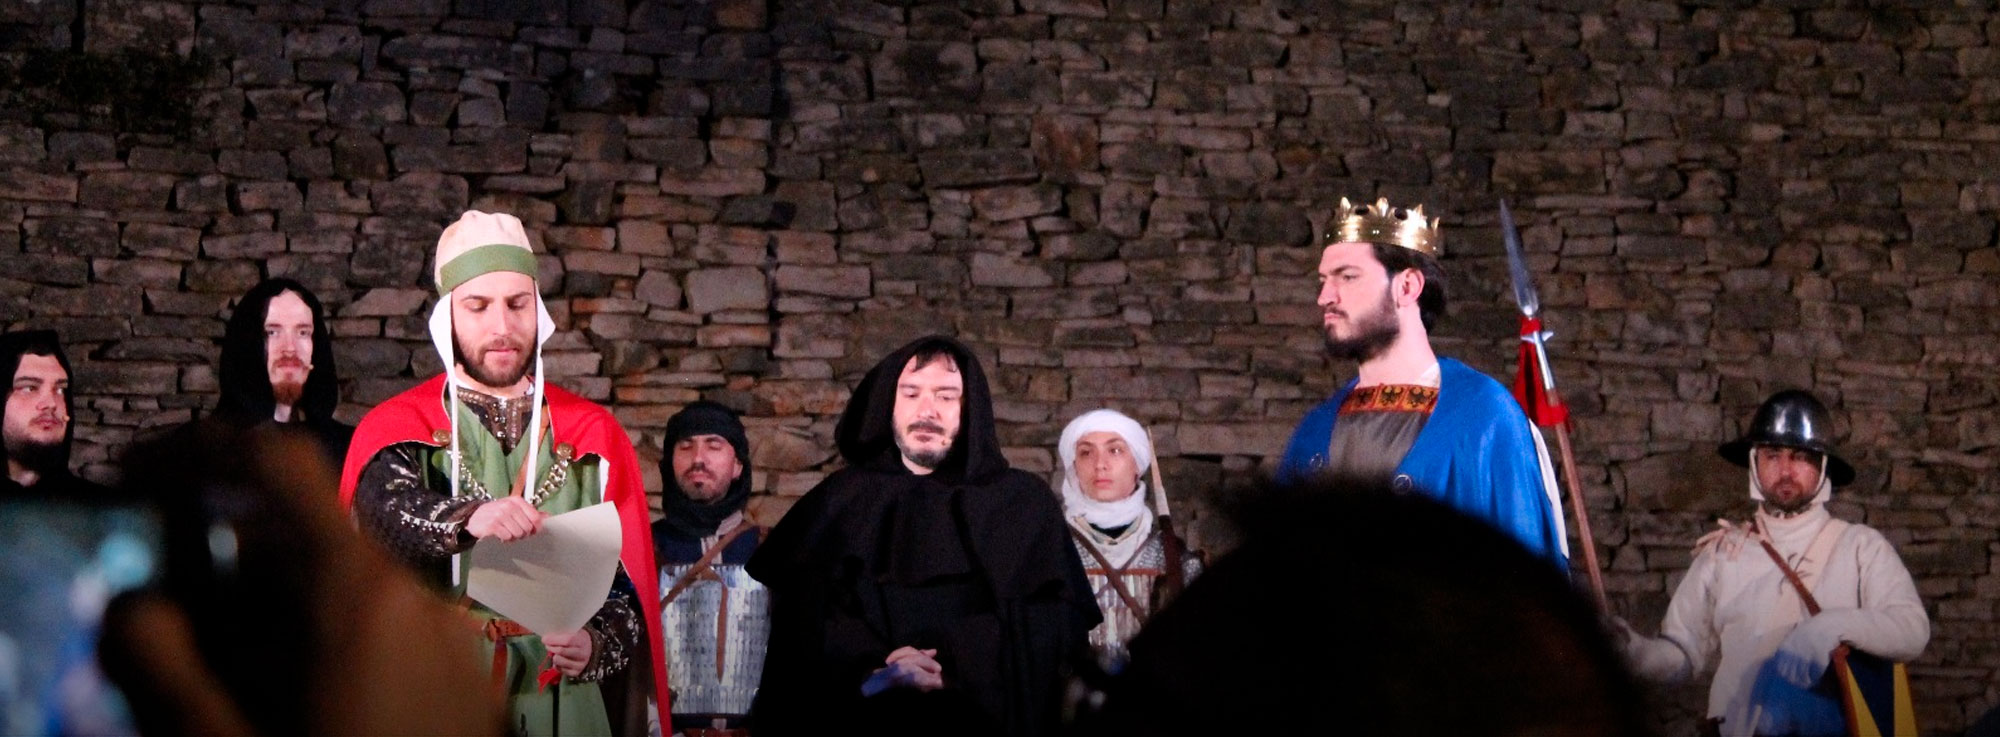 Terlizzi: Notti Medievali